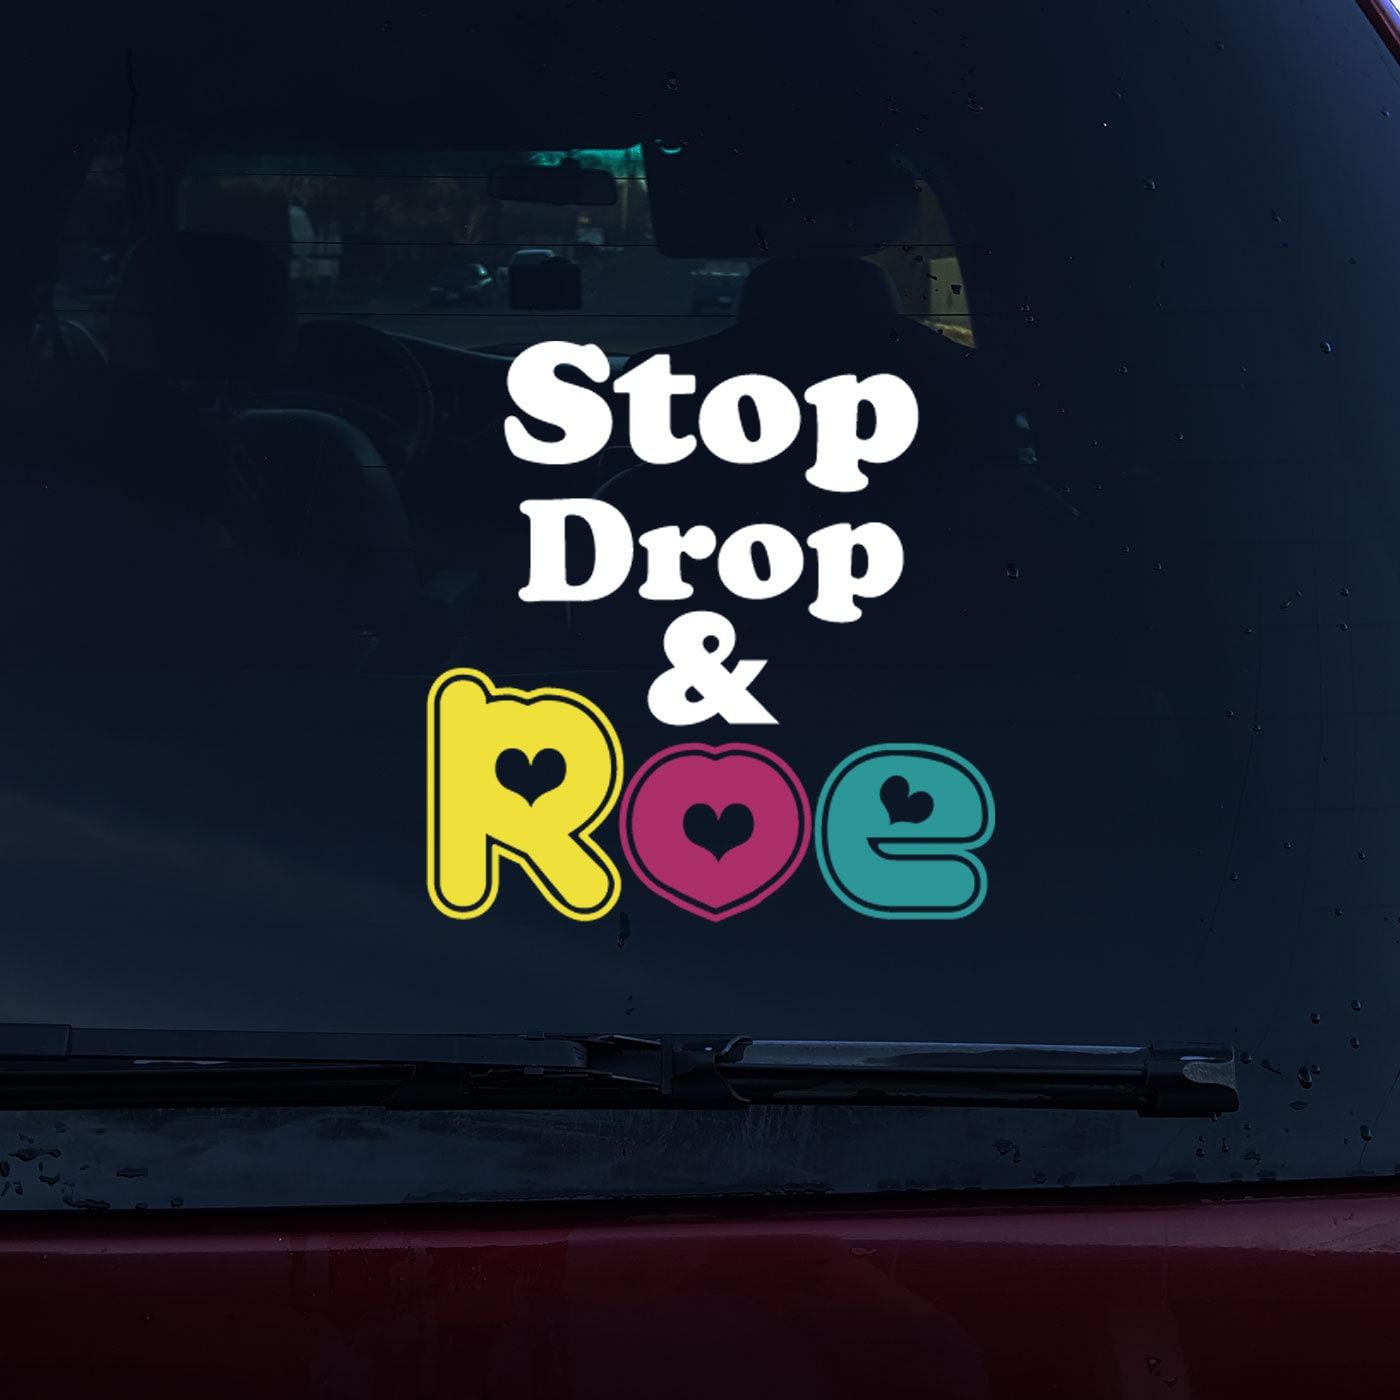 Stop Drop And Roe Vinyl Decal Vinyl Sticker Vinyl Car Decal - Advocare car decal stickers